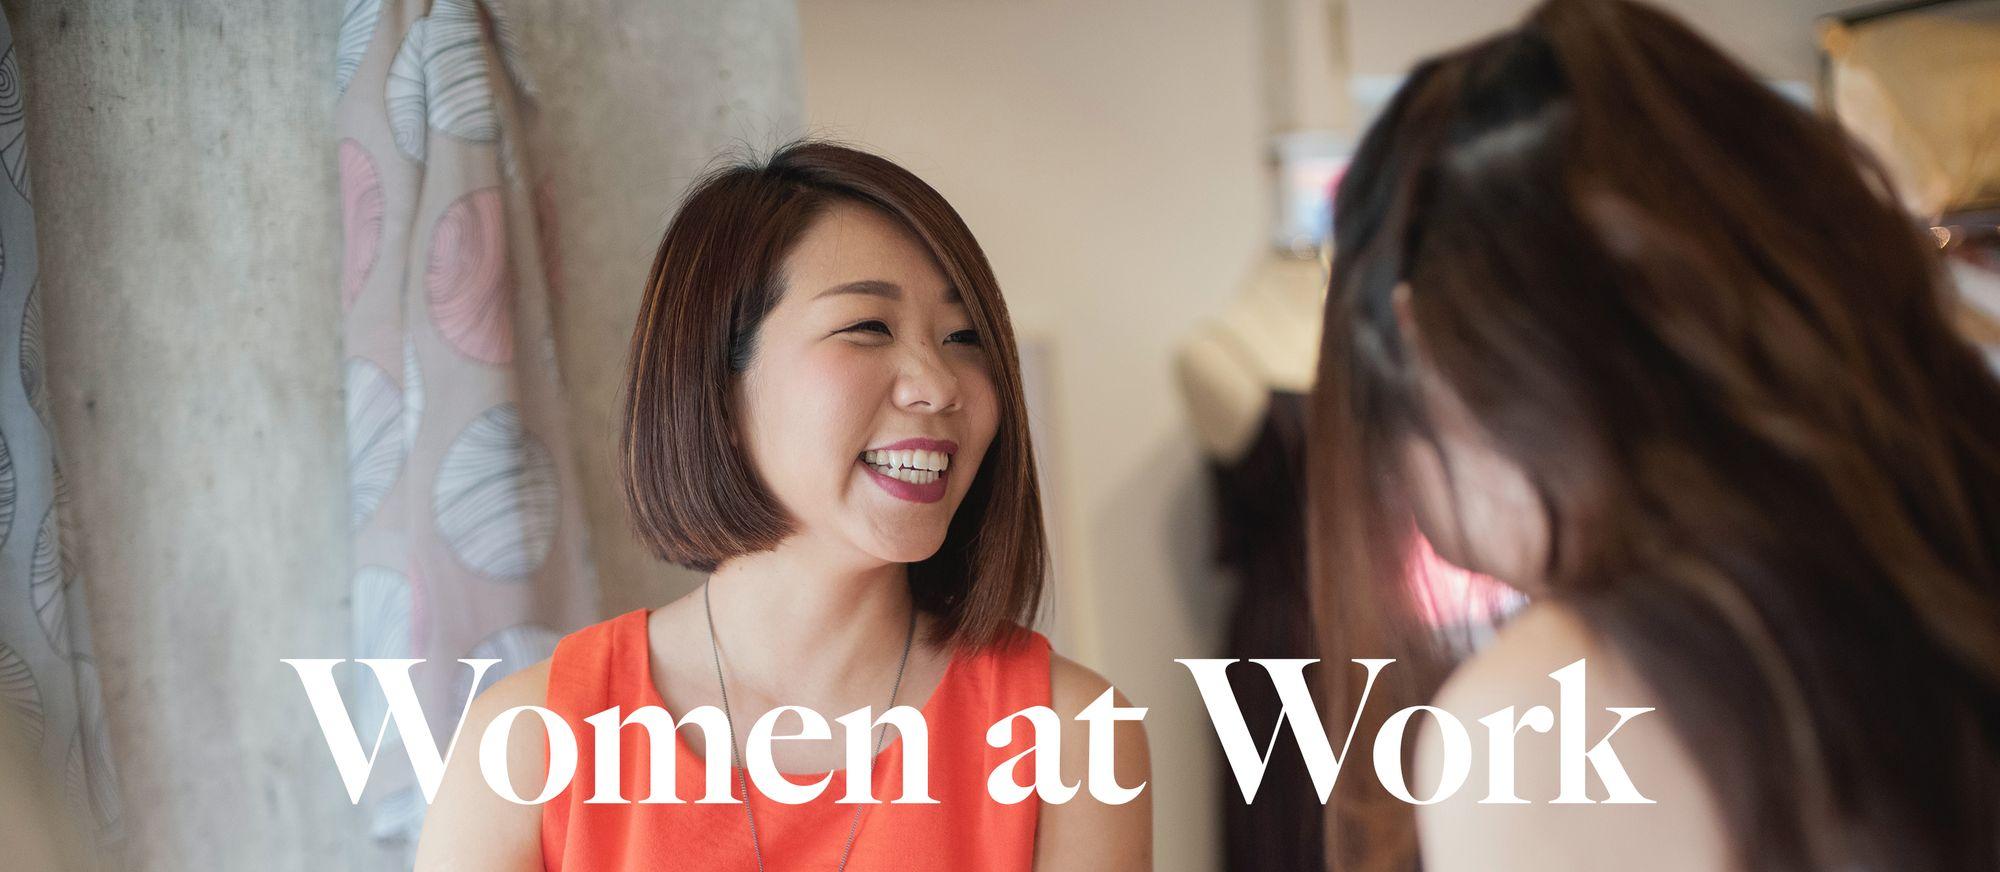 Women at Work - Edition 4